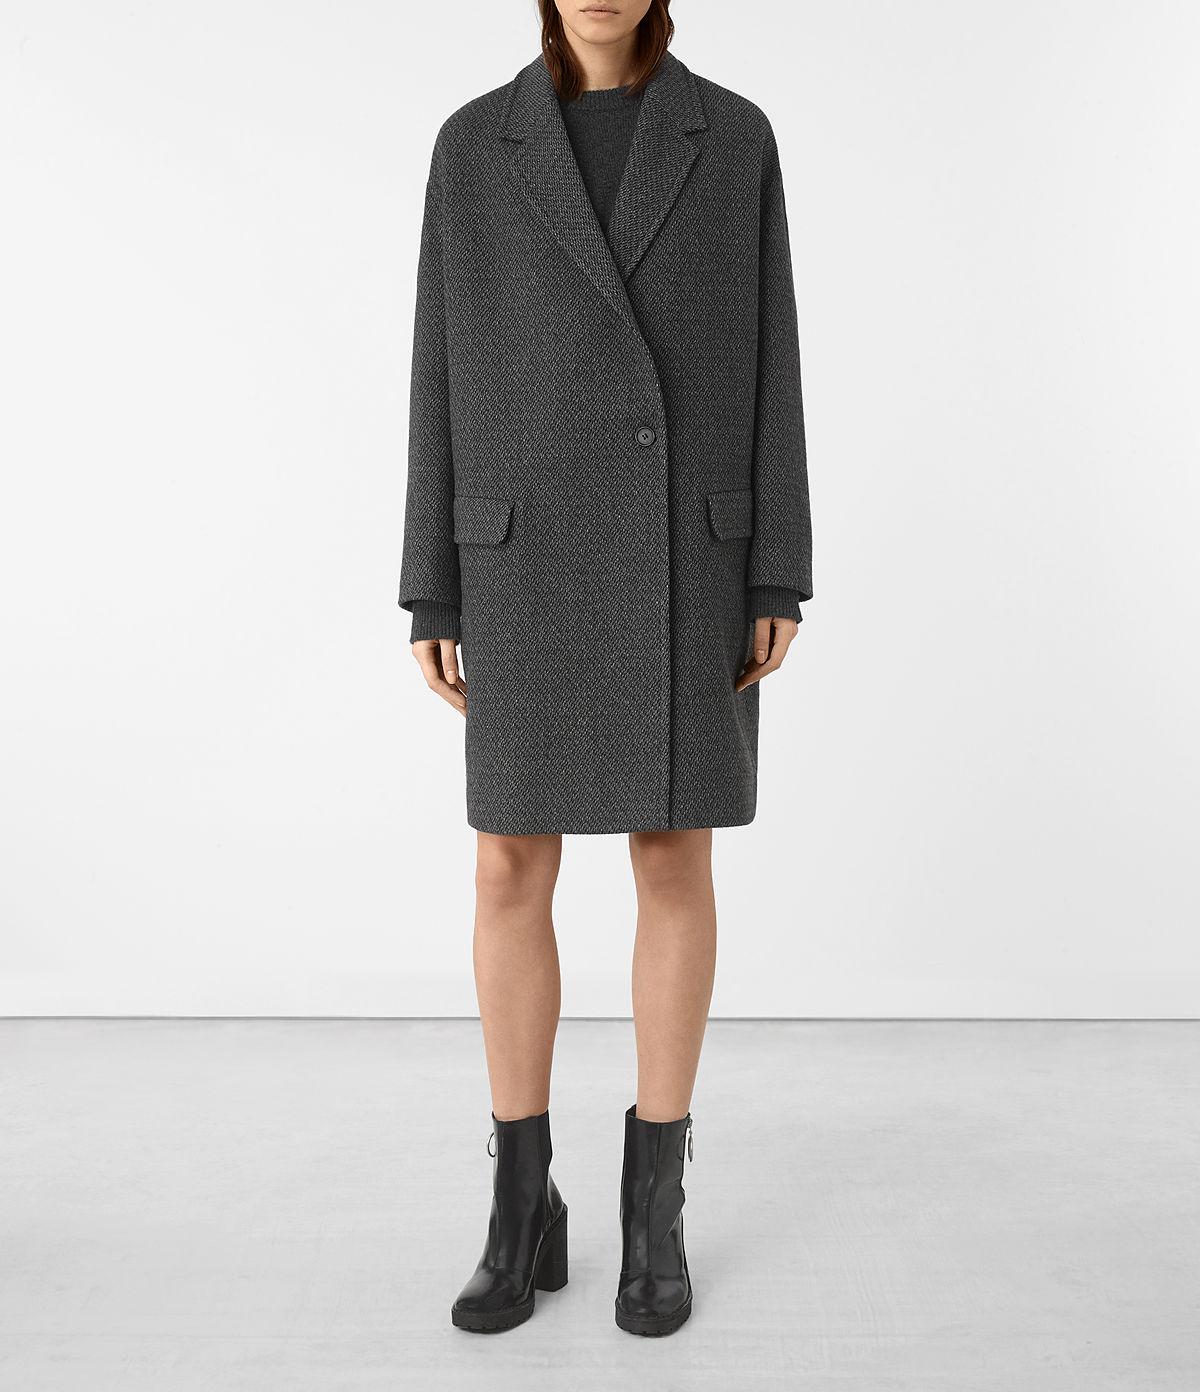 ada-teco-coat